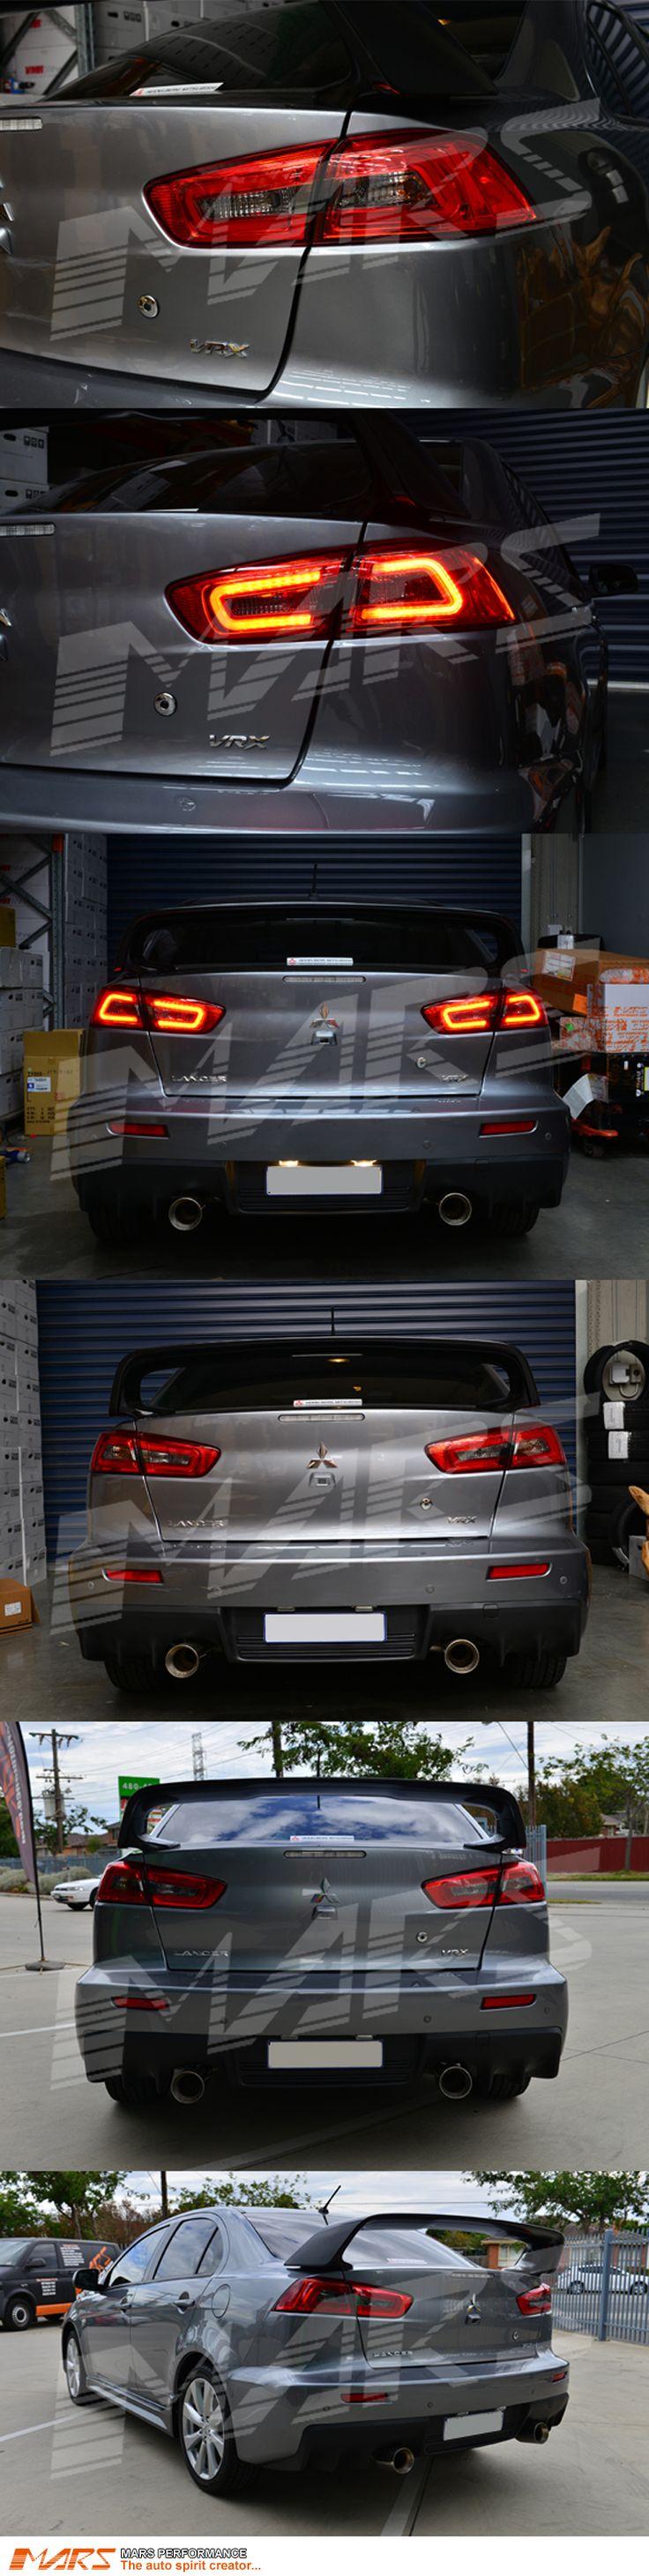 JDM Varis Smoked Red 3D LED Tail lights for Mitsubishi Lancer CJ & EVO X Sedan 07-15 | Mars Performance